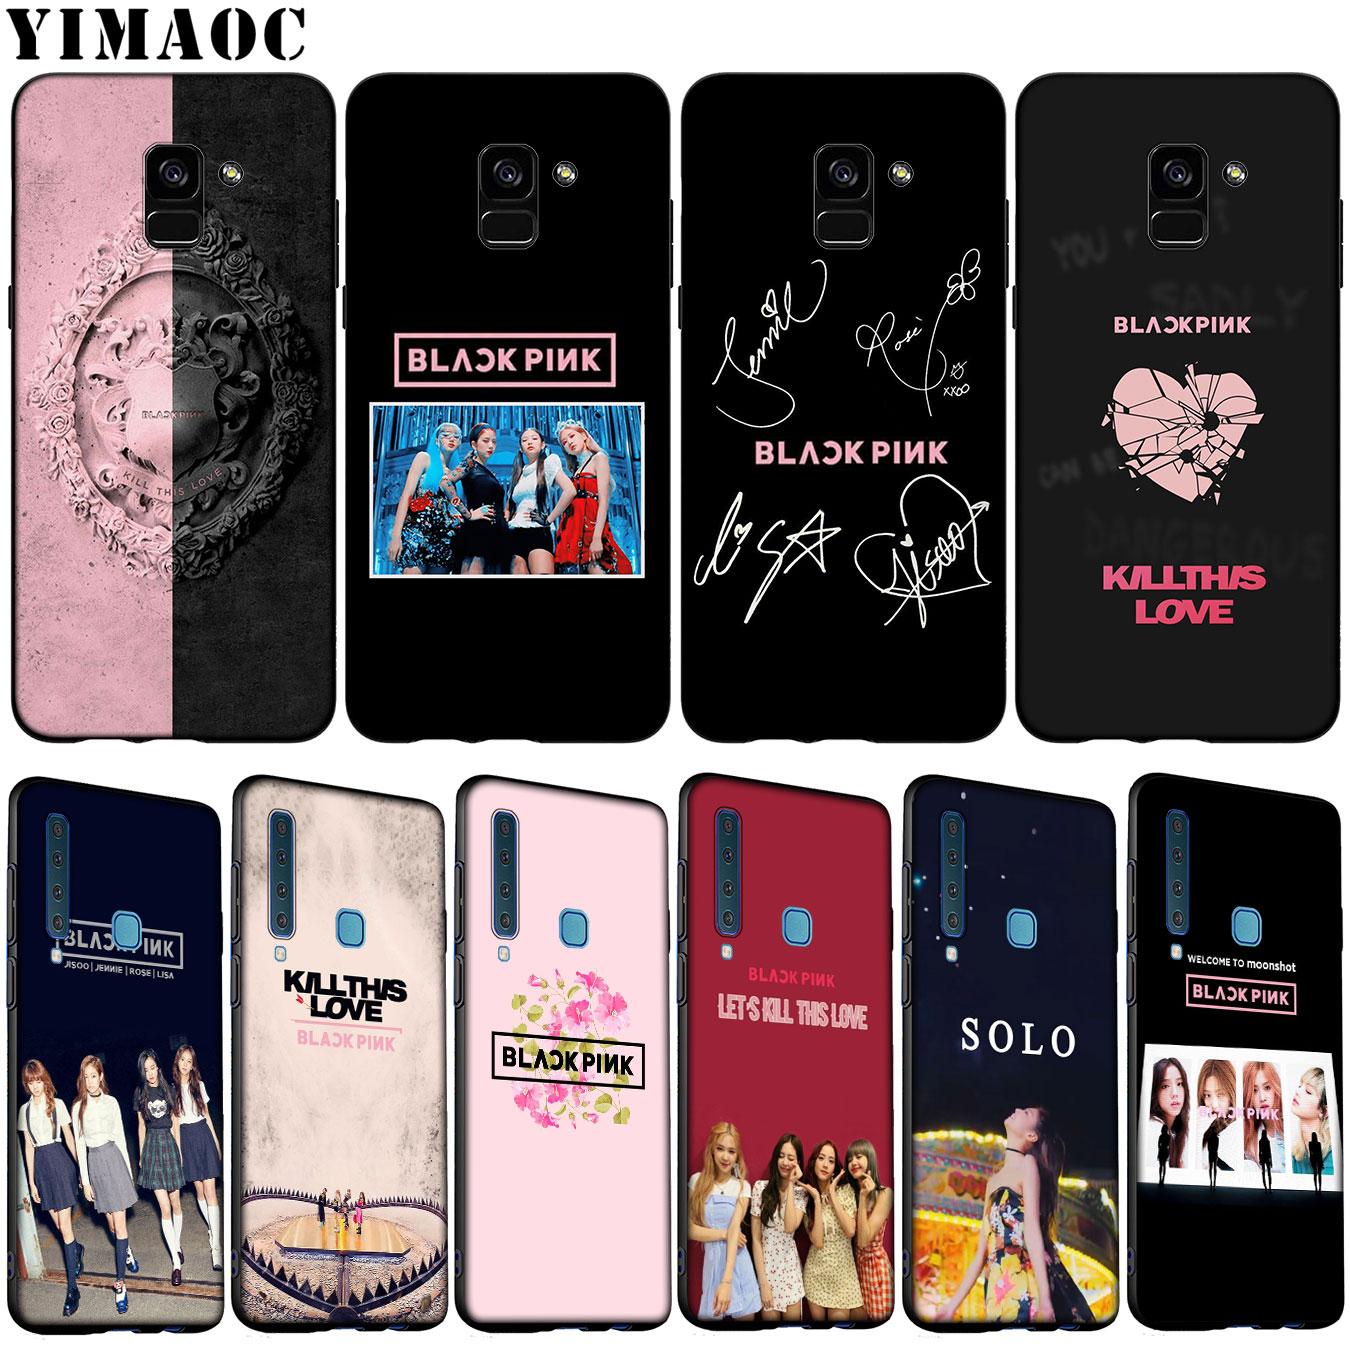 YIMAOC blackpink Kpop suave del teléfono de silicona funda para Samsung Galaxy A6 más A9 A8 A7 2018 A3 A5 2016 NOTA DE 2017 9 8 cubierta